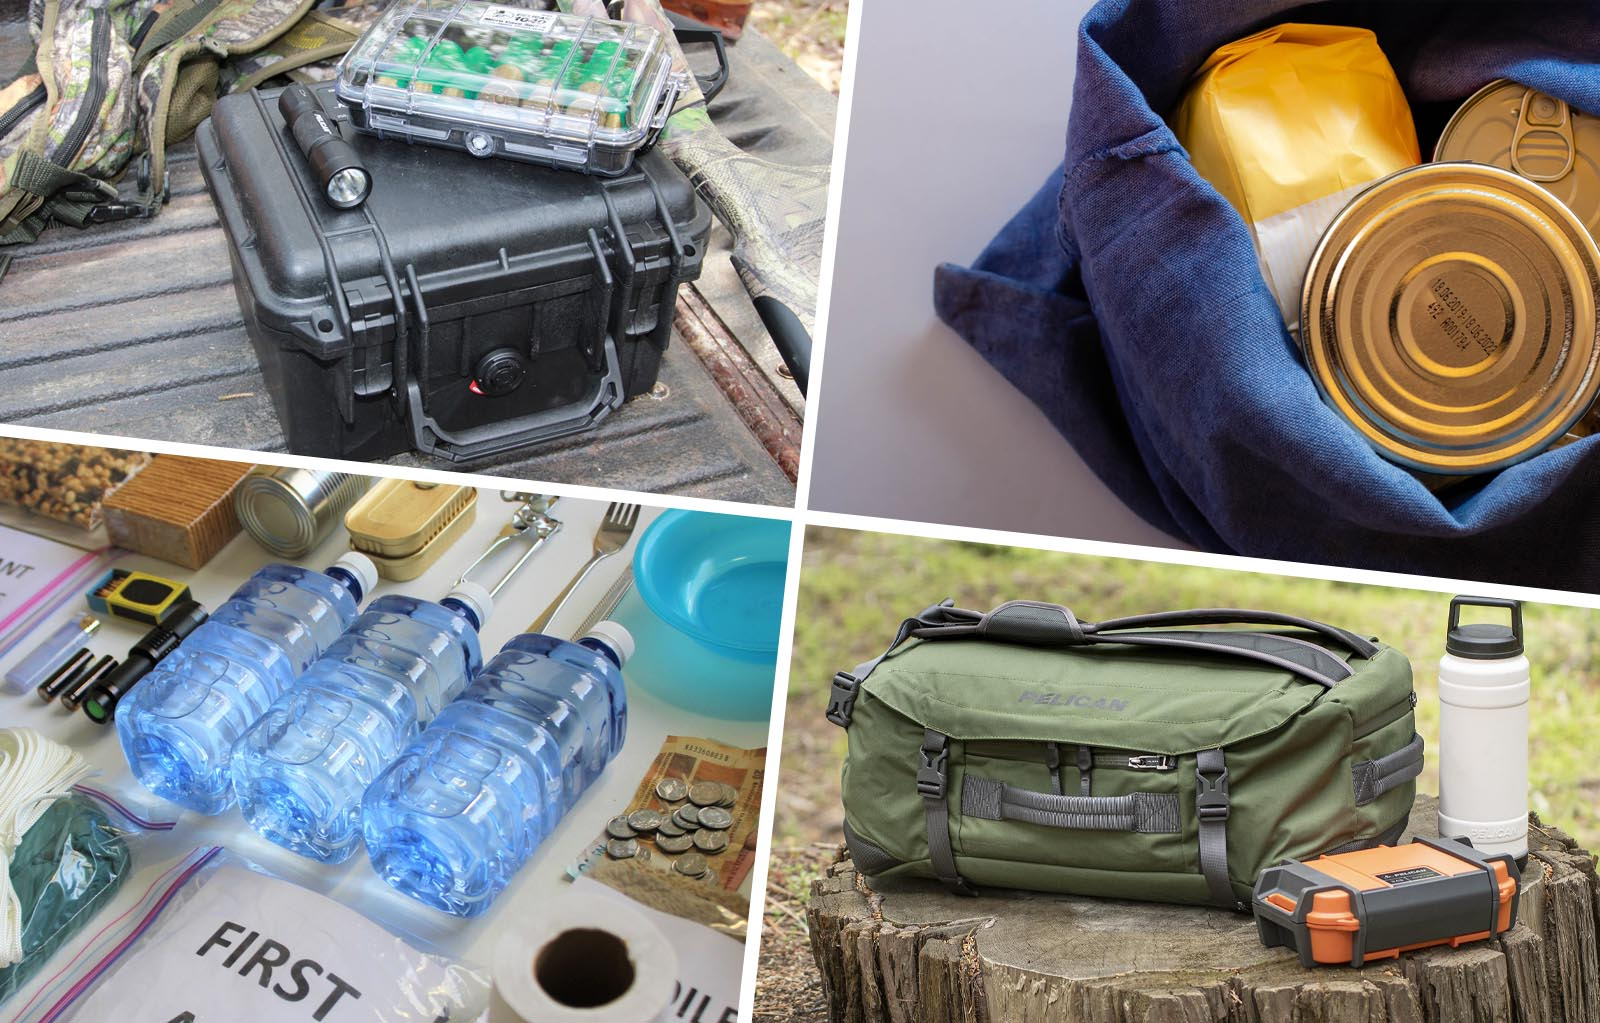 water flashlight batteries case emergency kit